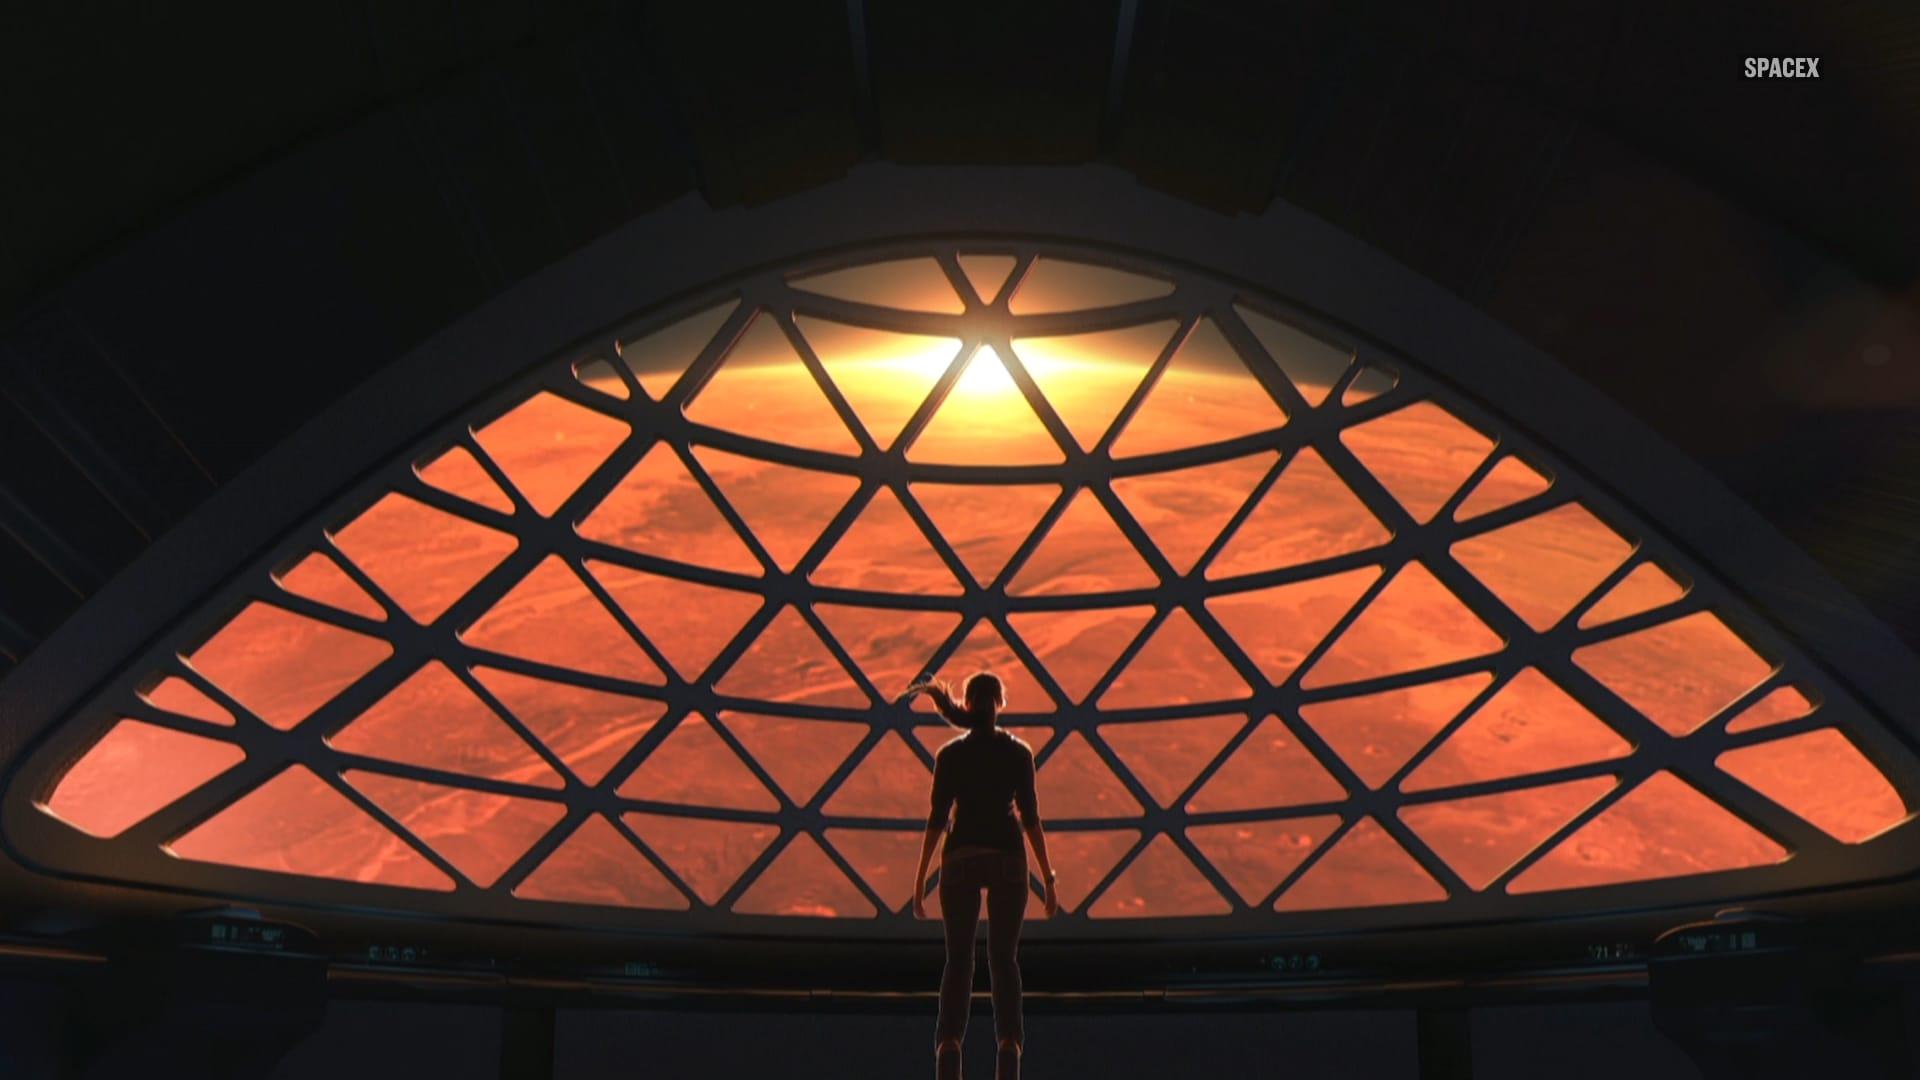 Elon Musk: Jeff Bezos's plan to live in space 'makes no sense'